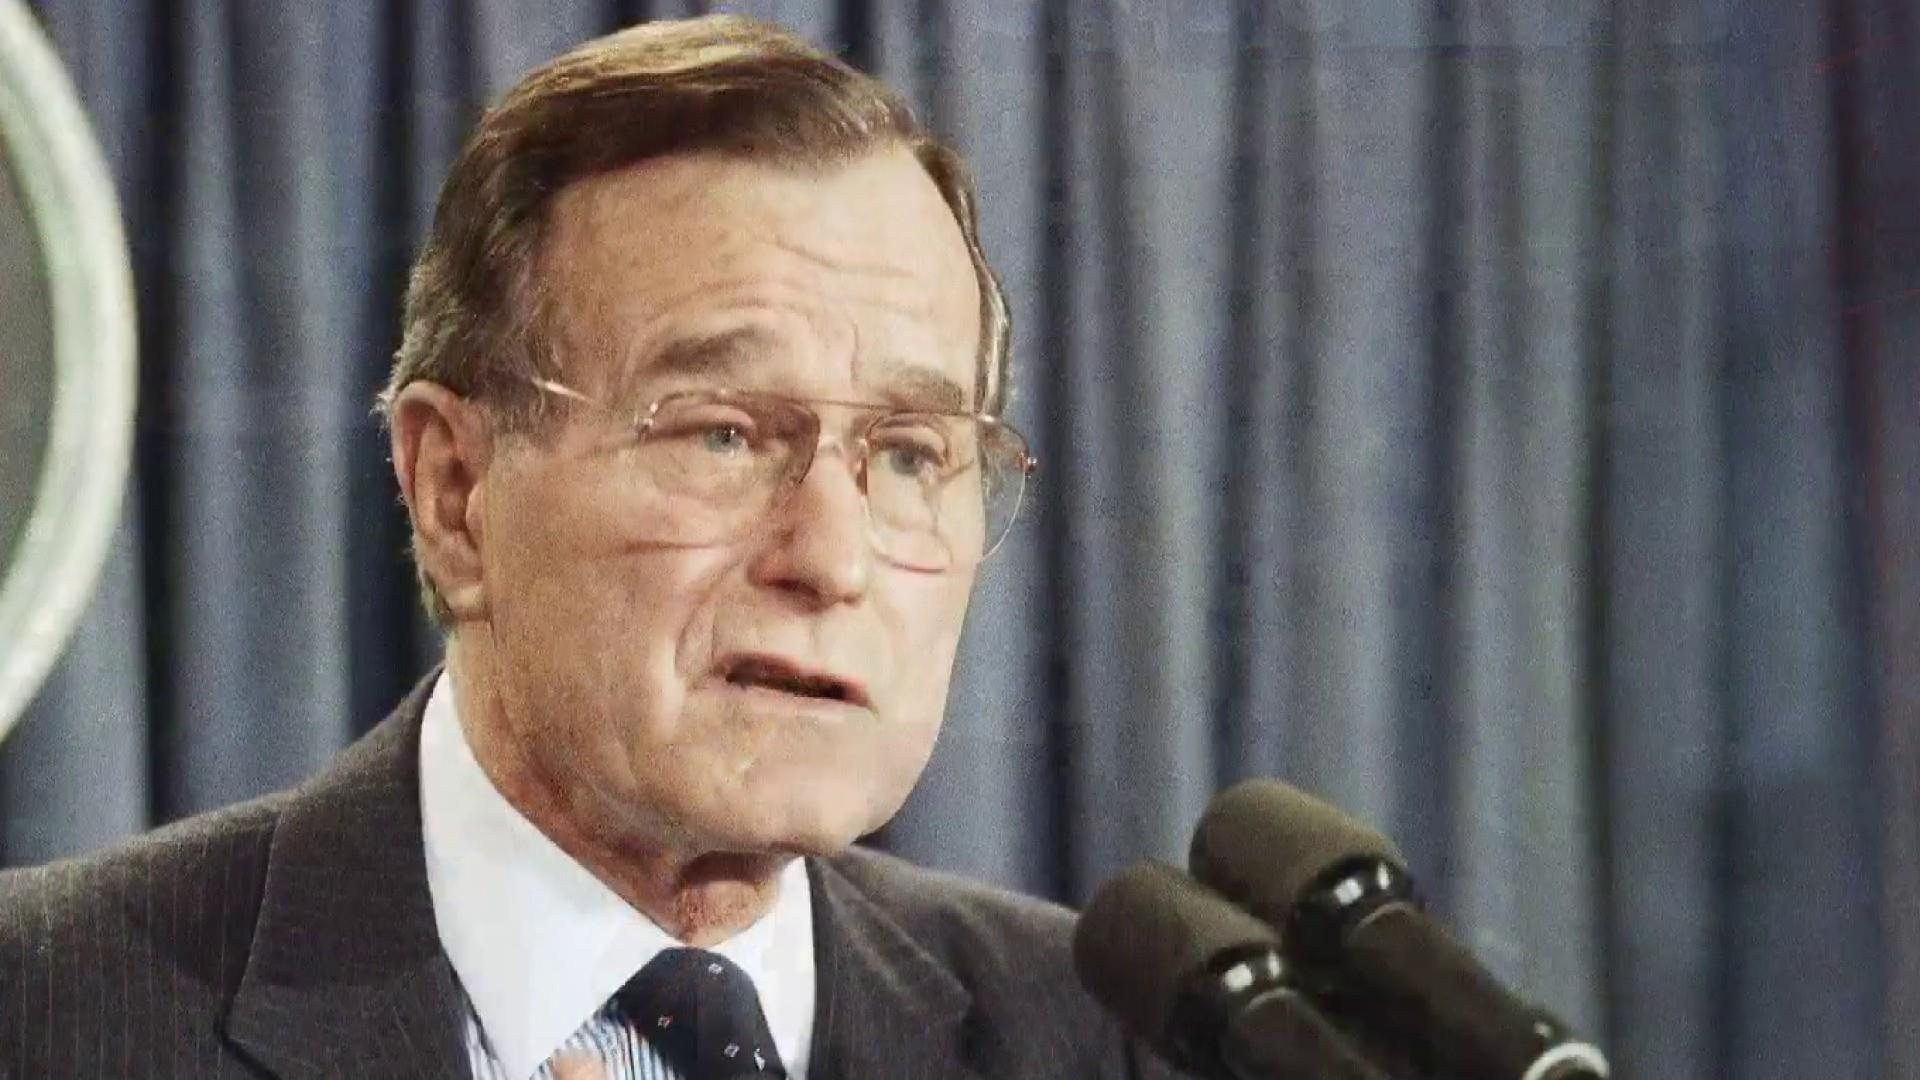 Brokaw: Bush the final president from the 'Greatest Generation'